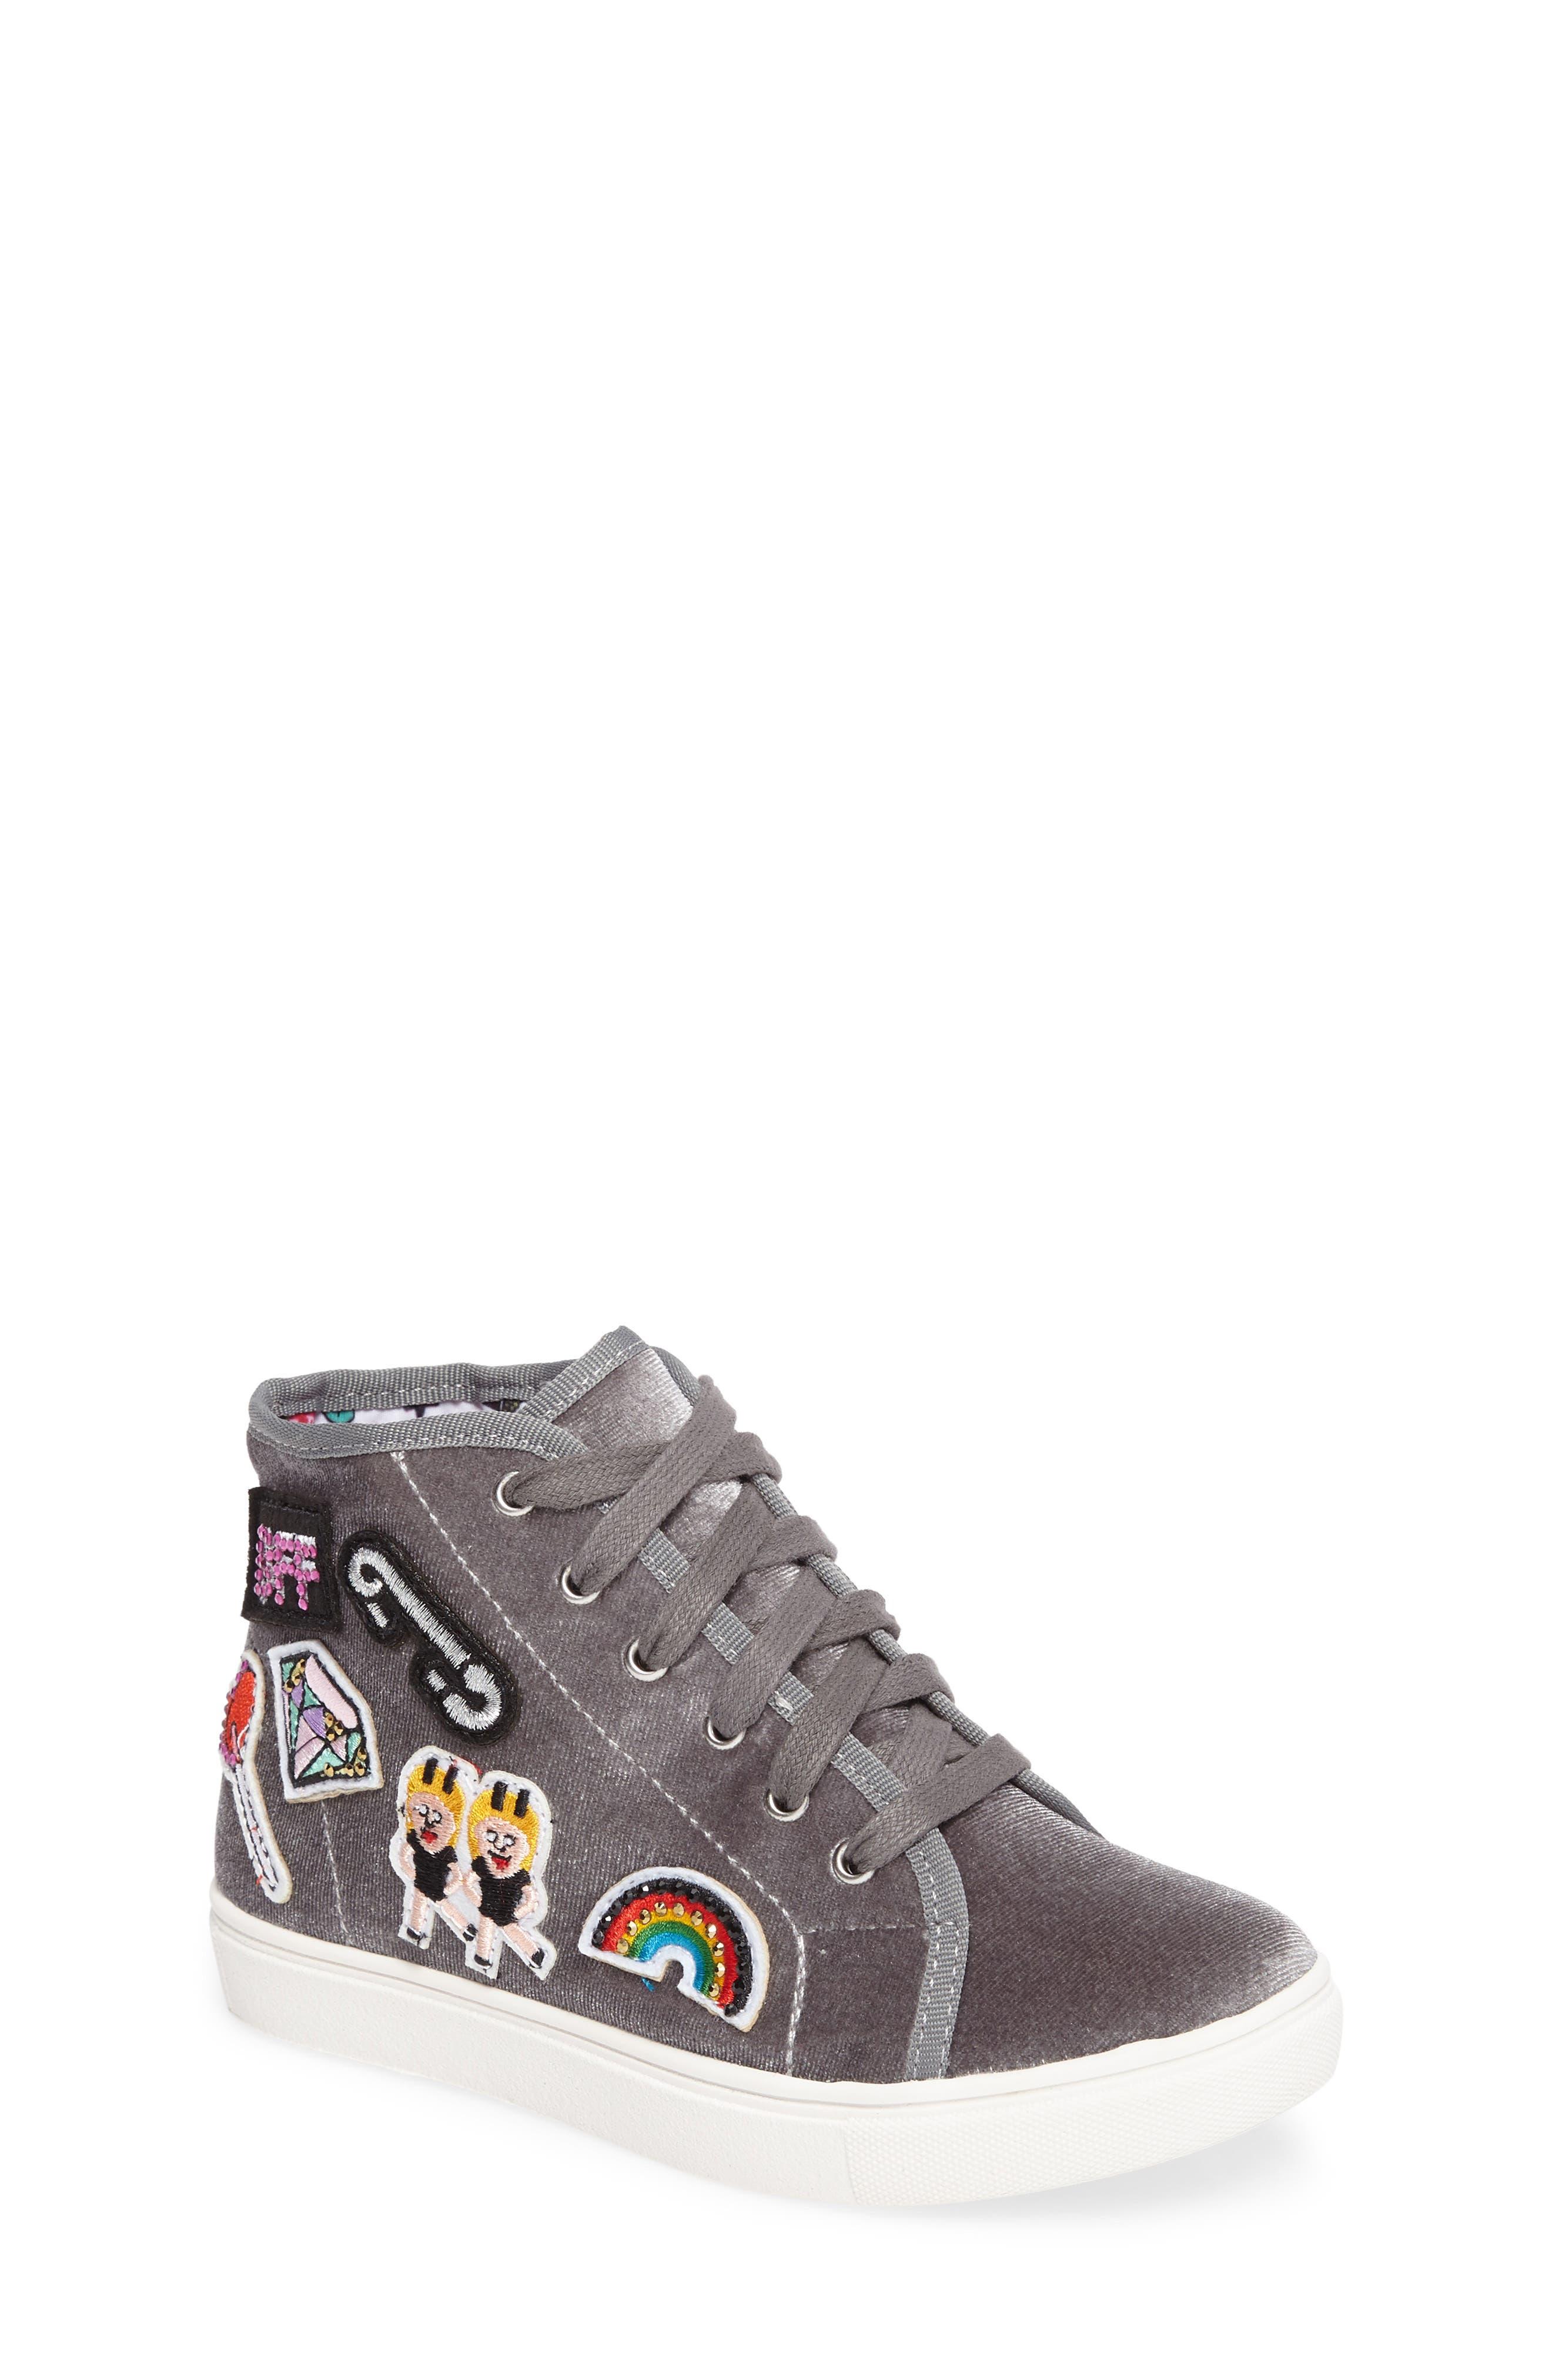 Steve Madden J-BFF High Top Sneaker (Little Kid & Big Kid)